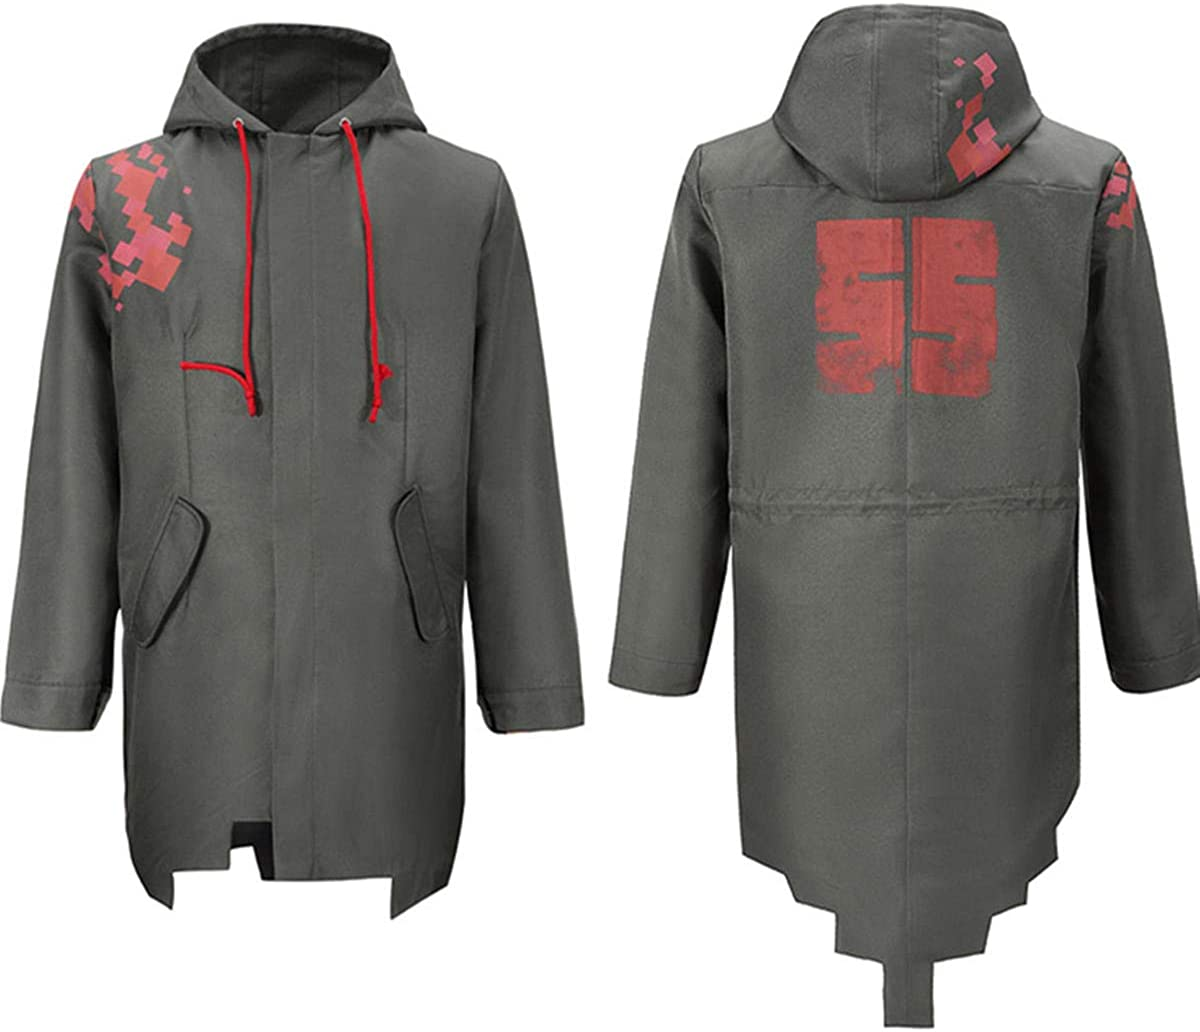 Weixu Nagito Komaeda Cosplay Complete Free Shipping Green Hoodie Jacket Super intense SALE Danganronpa Cos